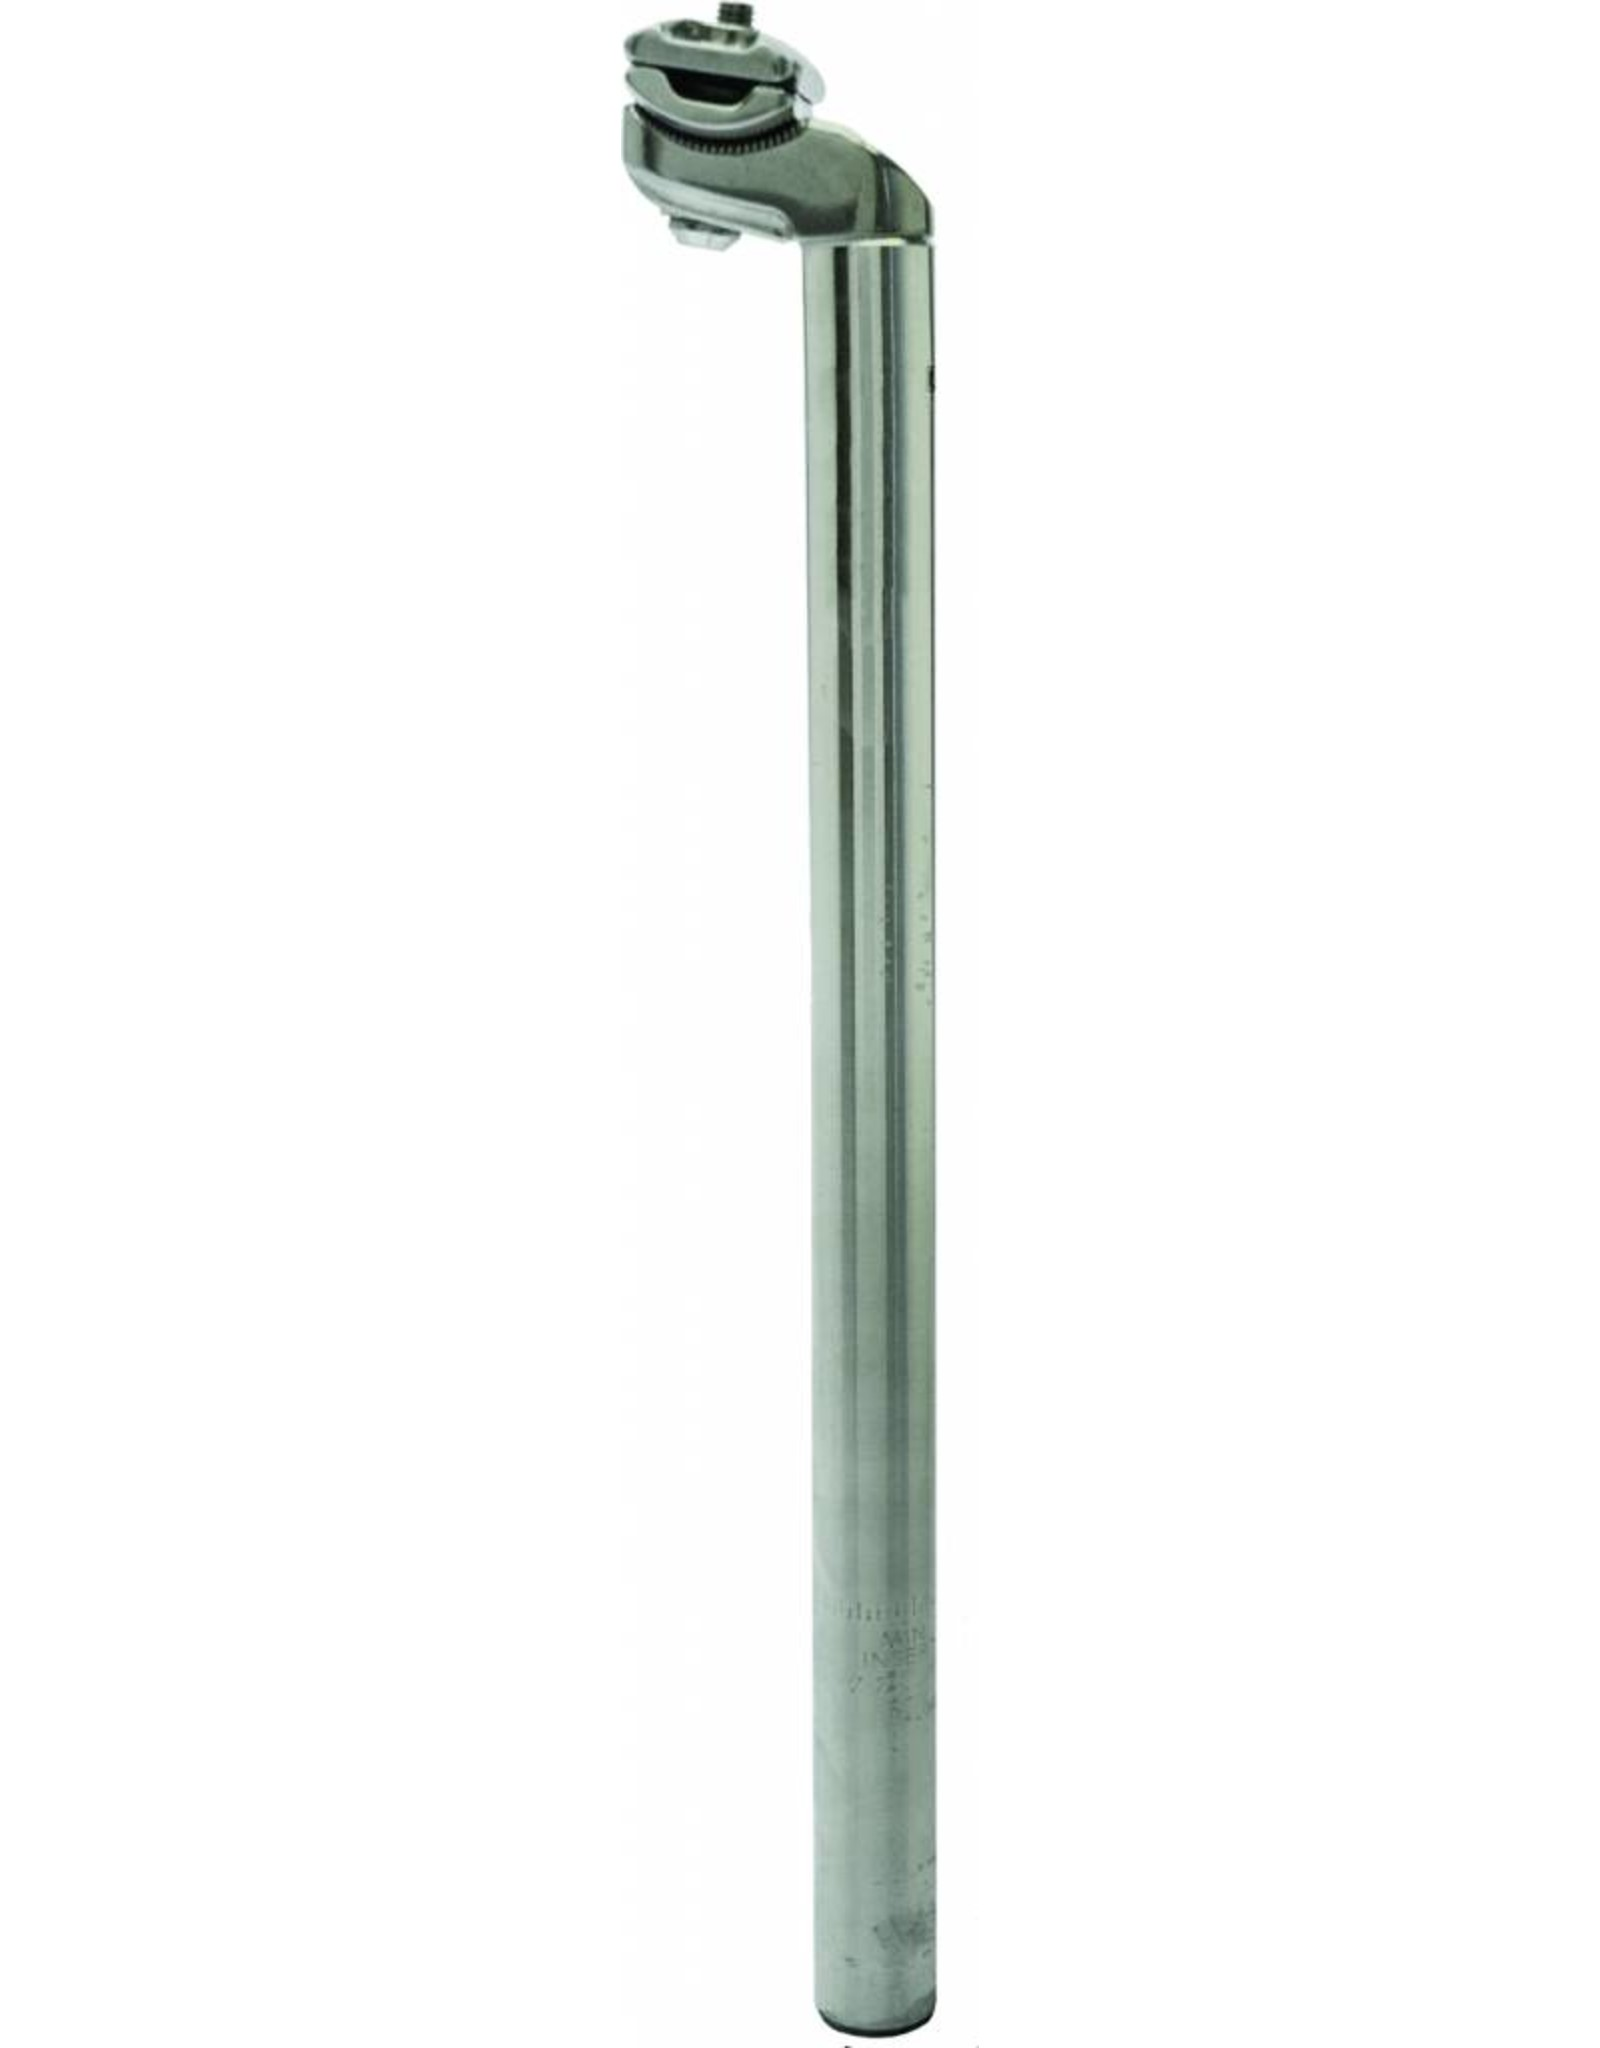 49N 27.2mm Alloy Seatpost